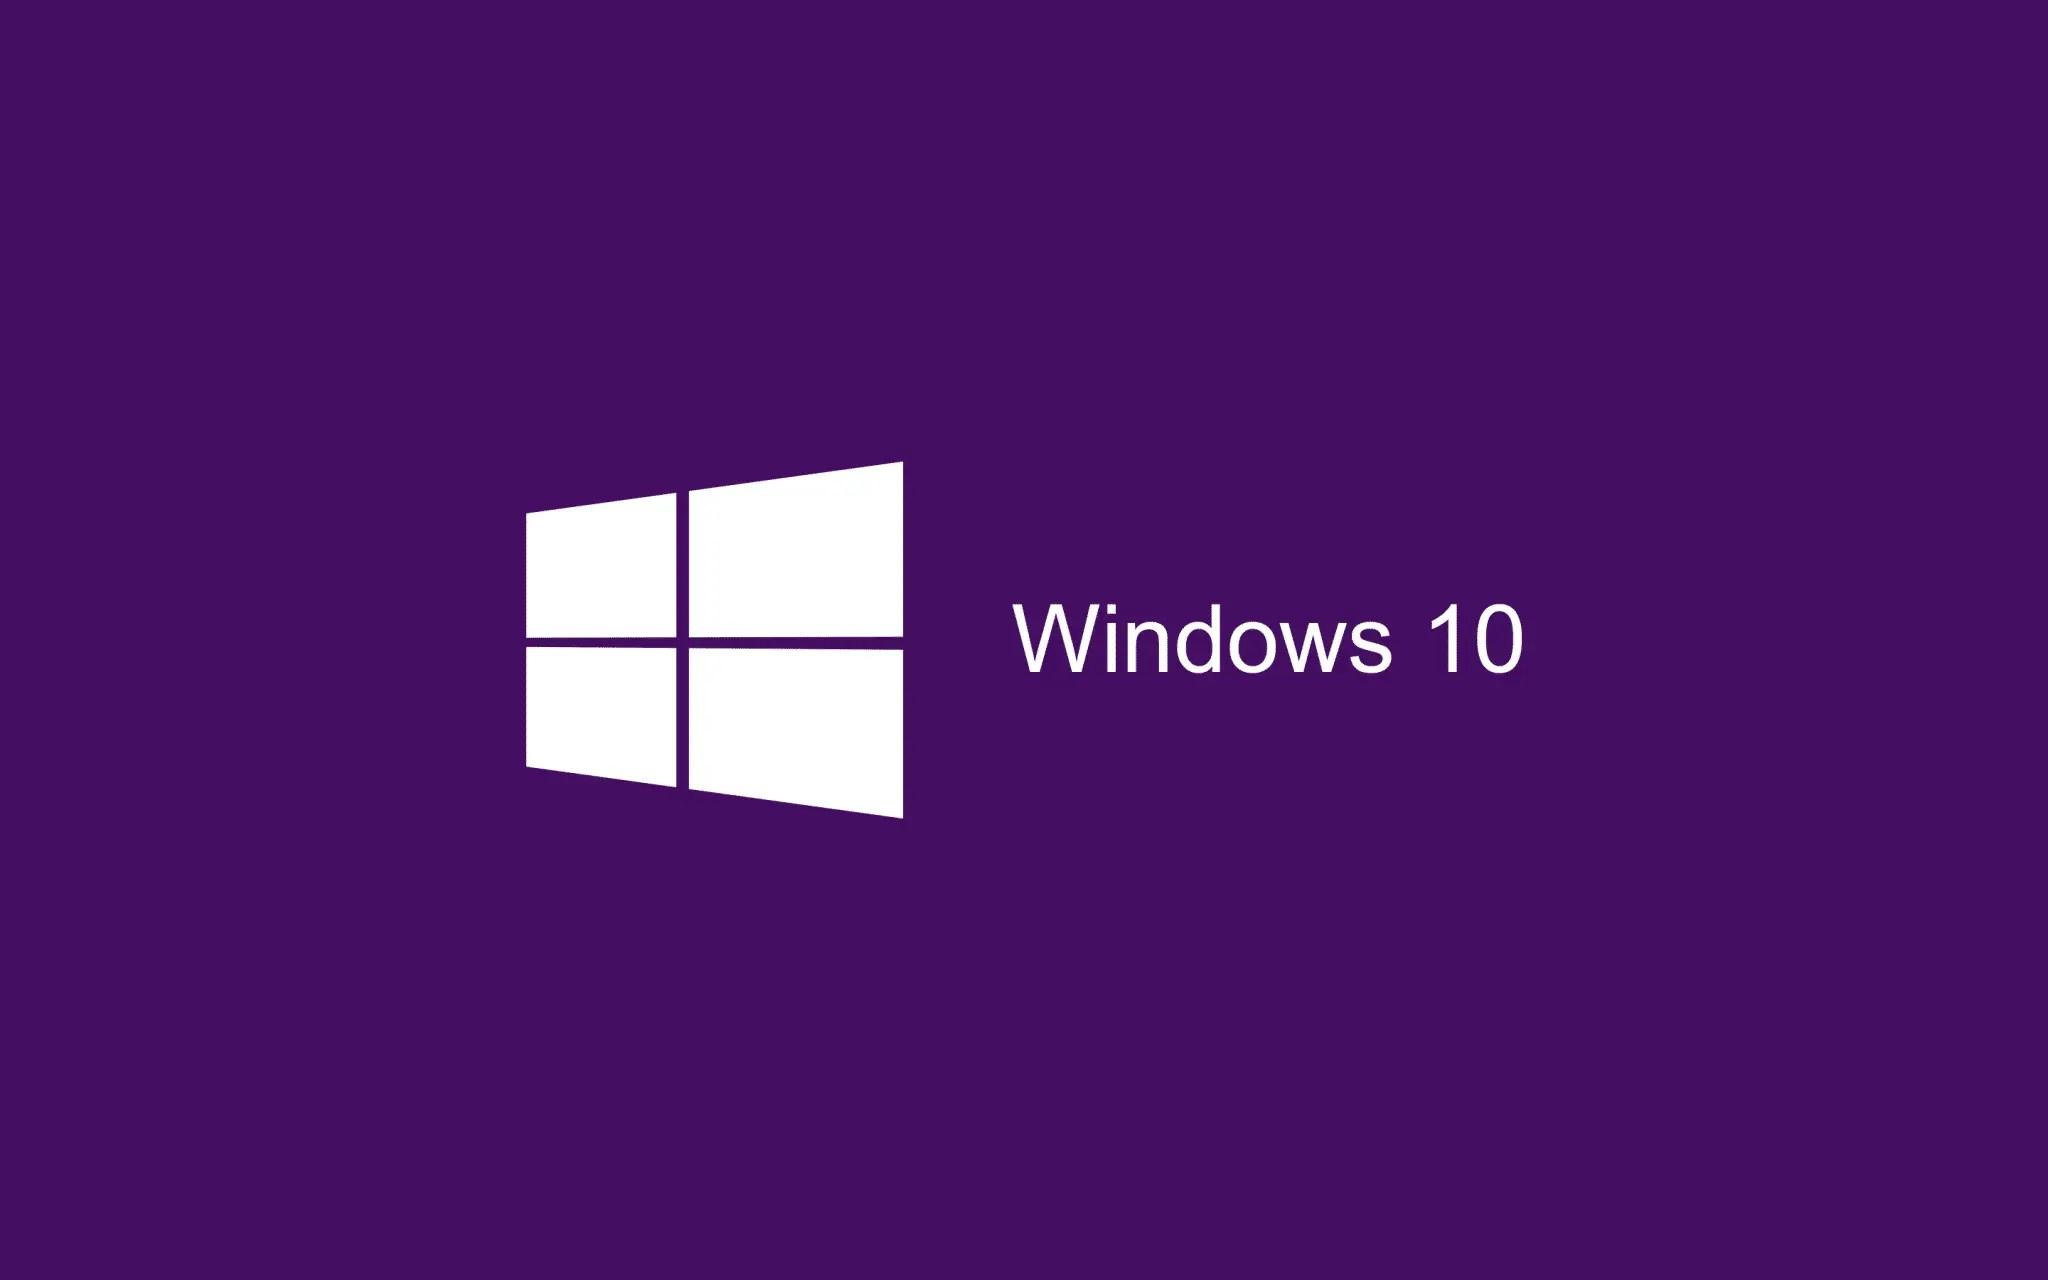 Purple Wallpaper Windows 10 HD 2880x1800